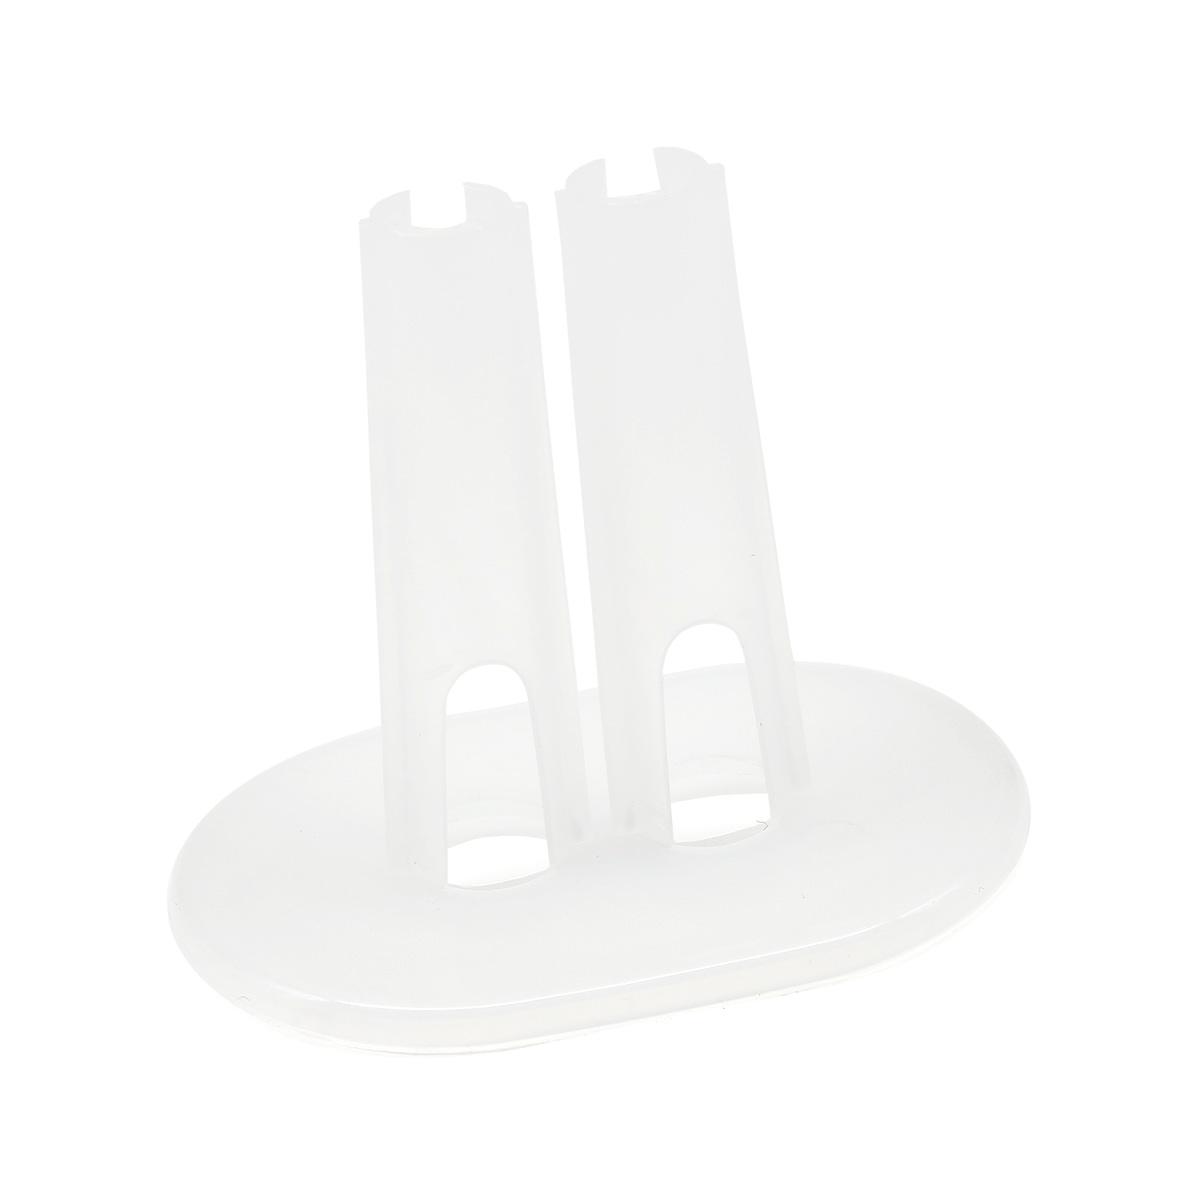 28520 Подставка для кукол прозрачная 8см*5см*7см, пластик, 1шт.